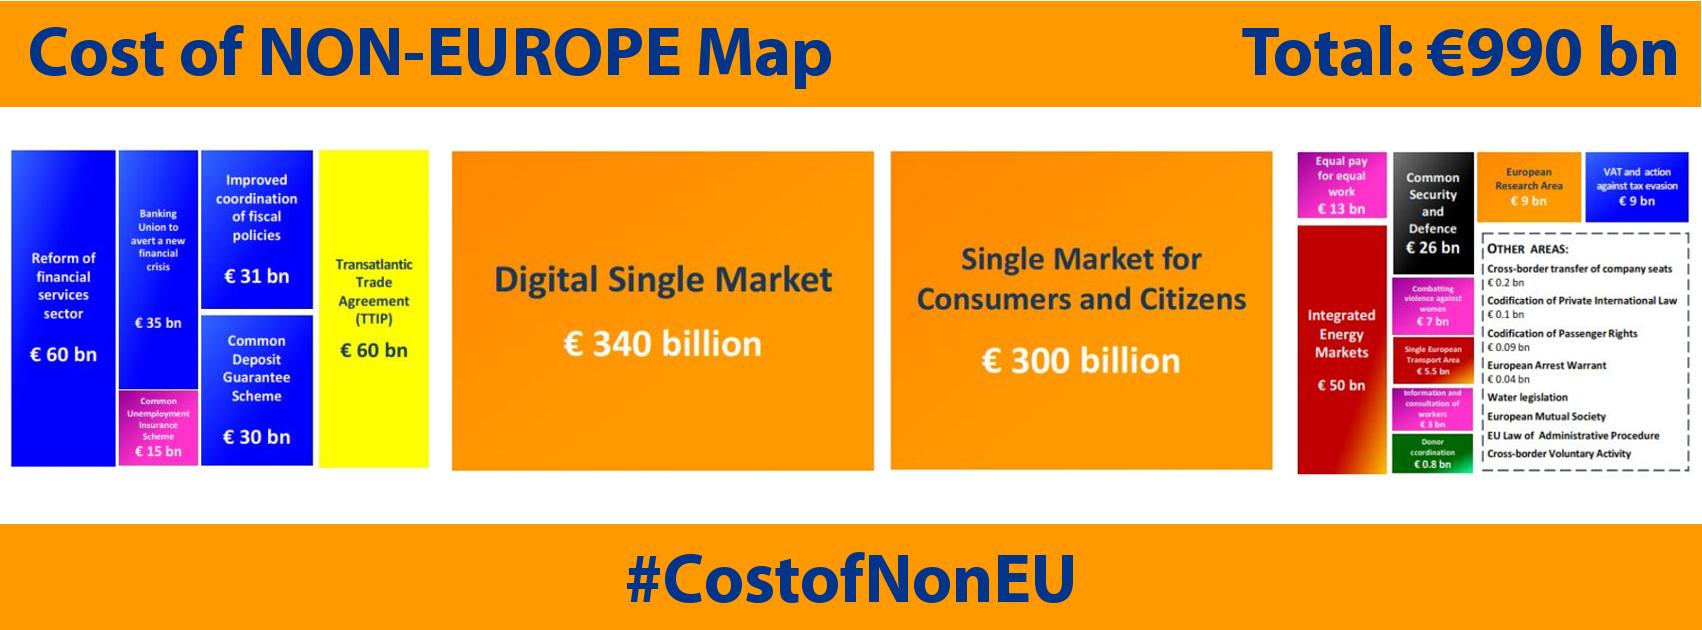 In Focus: Cost of Non-Europe